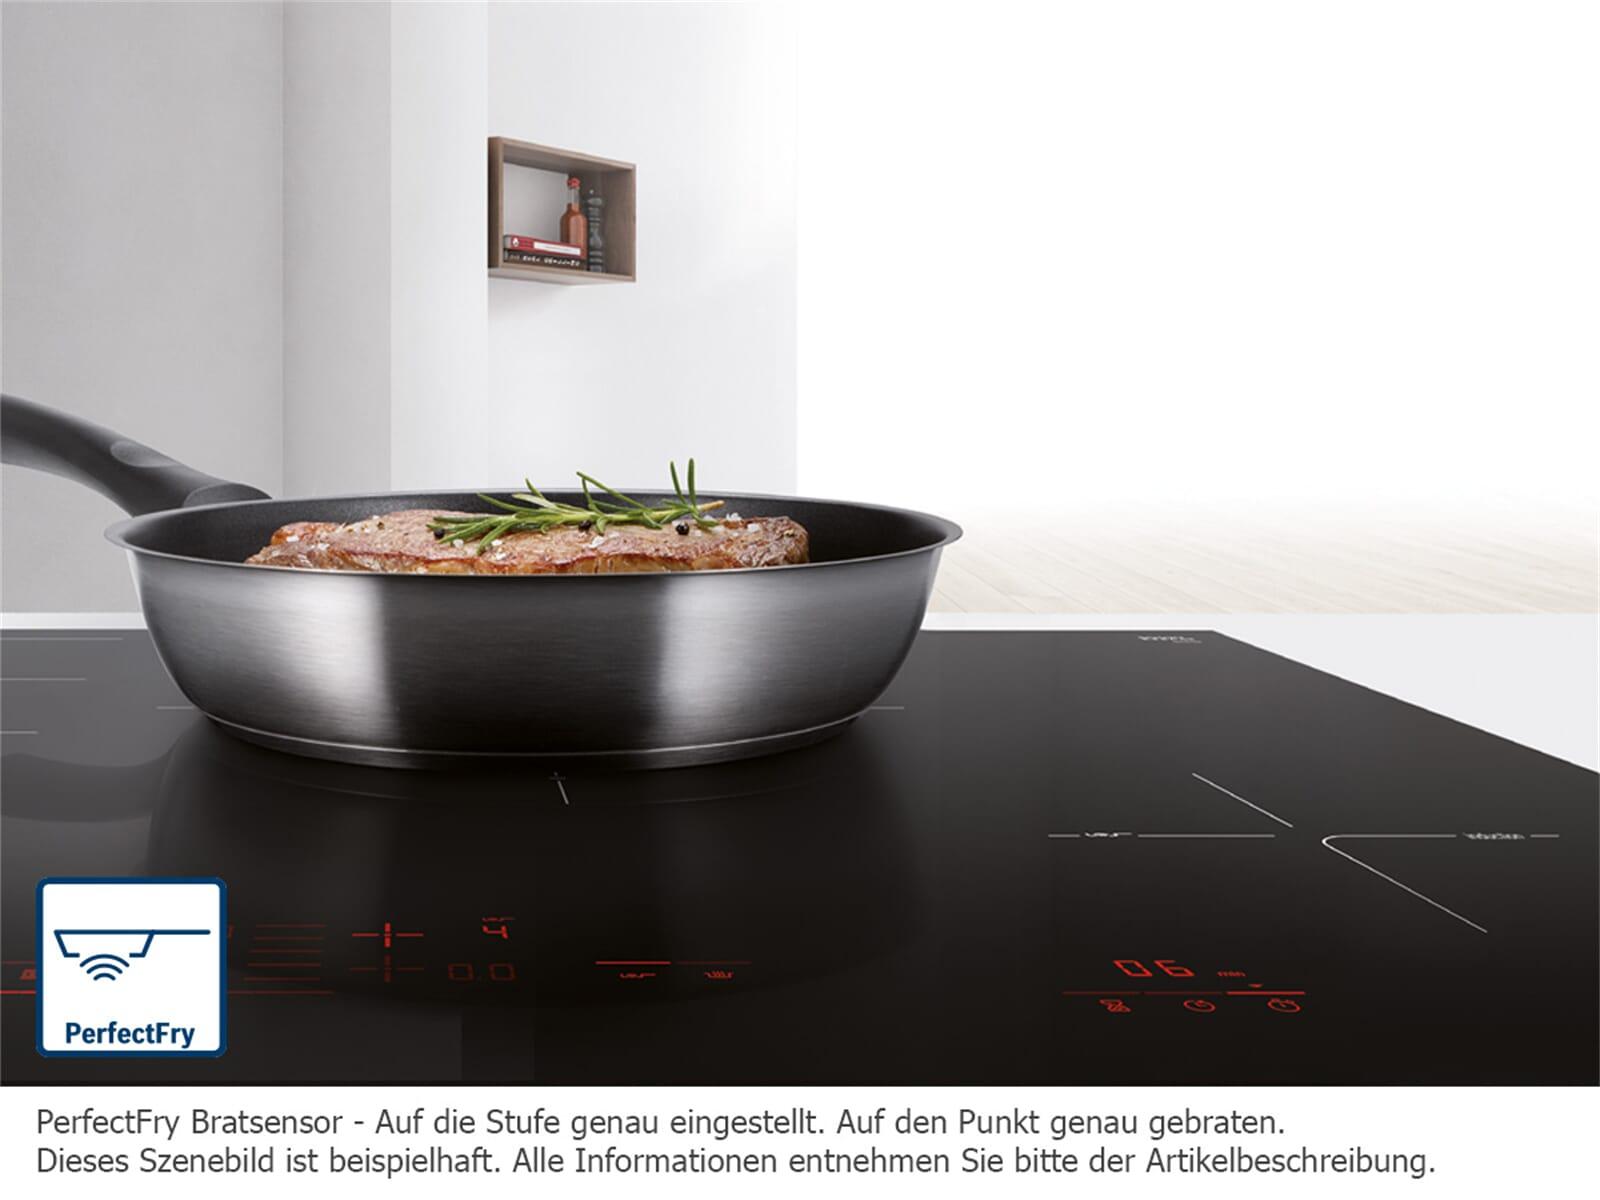 bosch pxv845fc1e induktionskochfeld autark. Black Bedroom Furniture Sets. Home Design Ideas